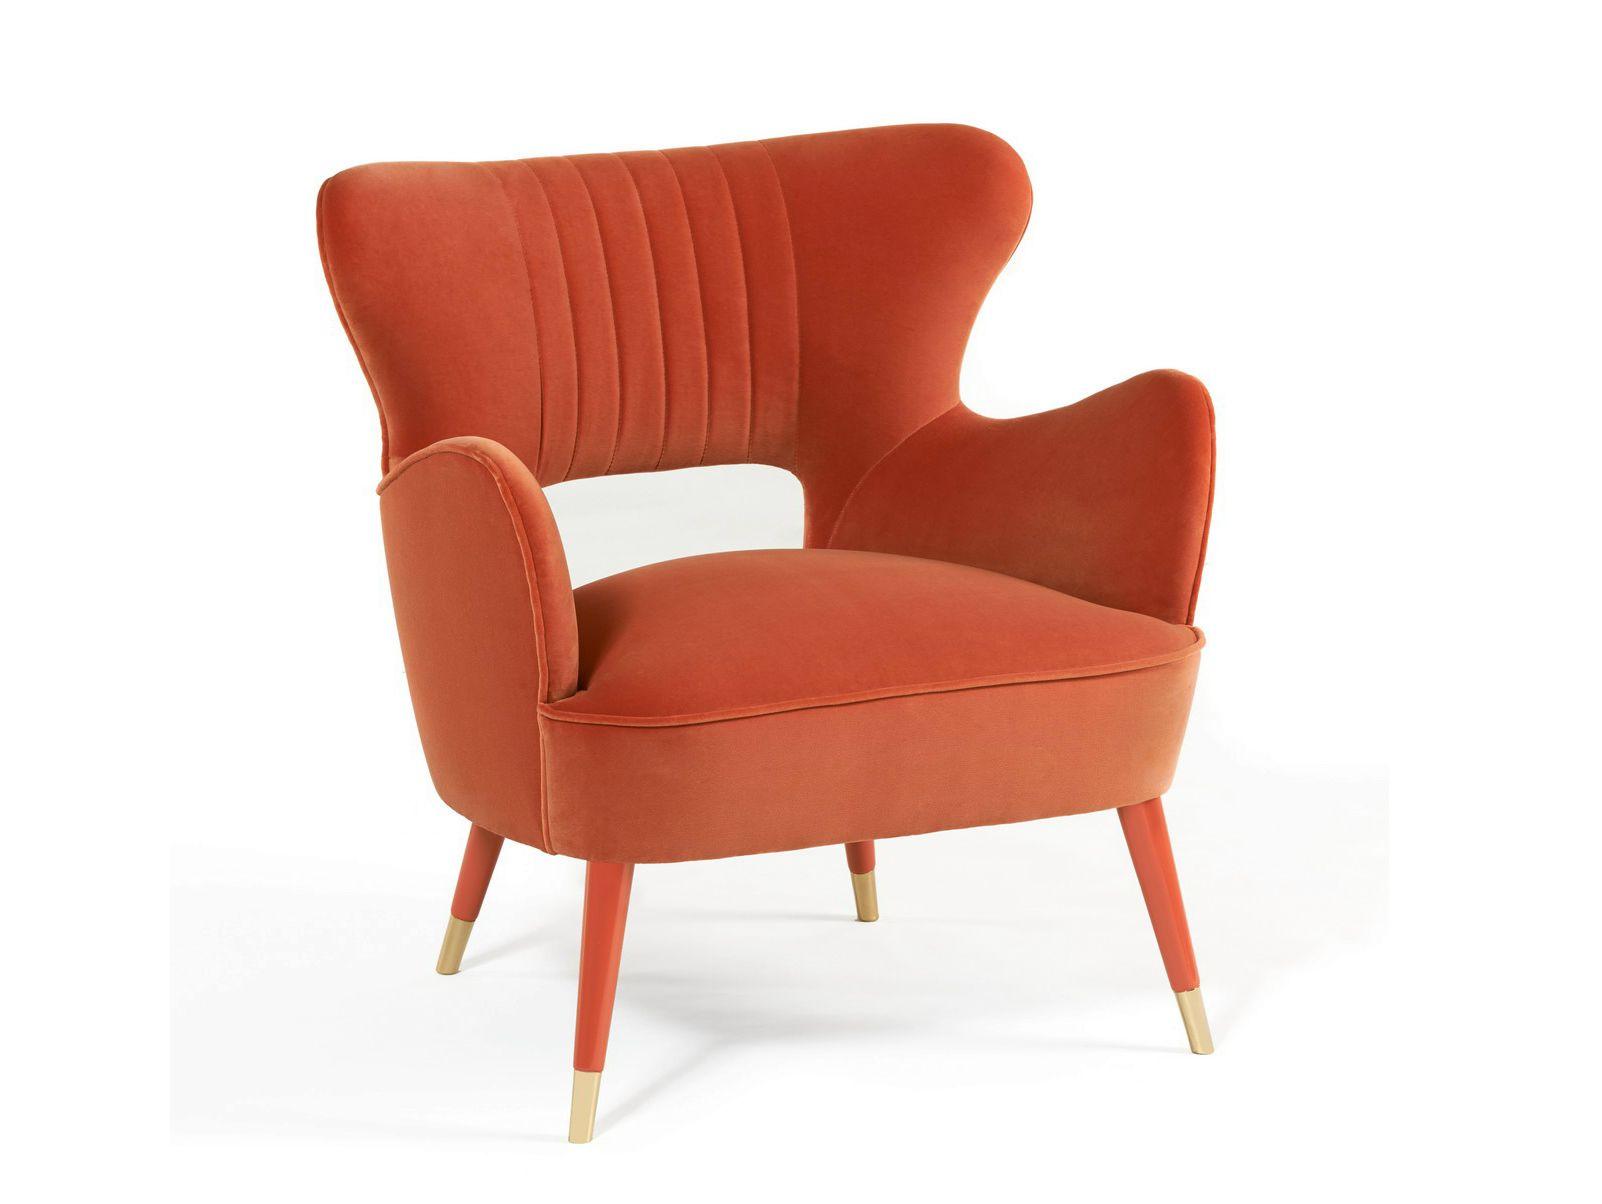 Кресло BEBE Коллекция Time by Munna | Muebles | Pinterest | Bebe